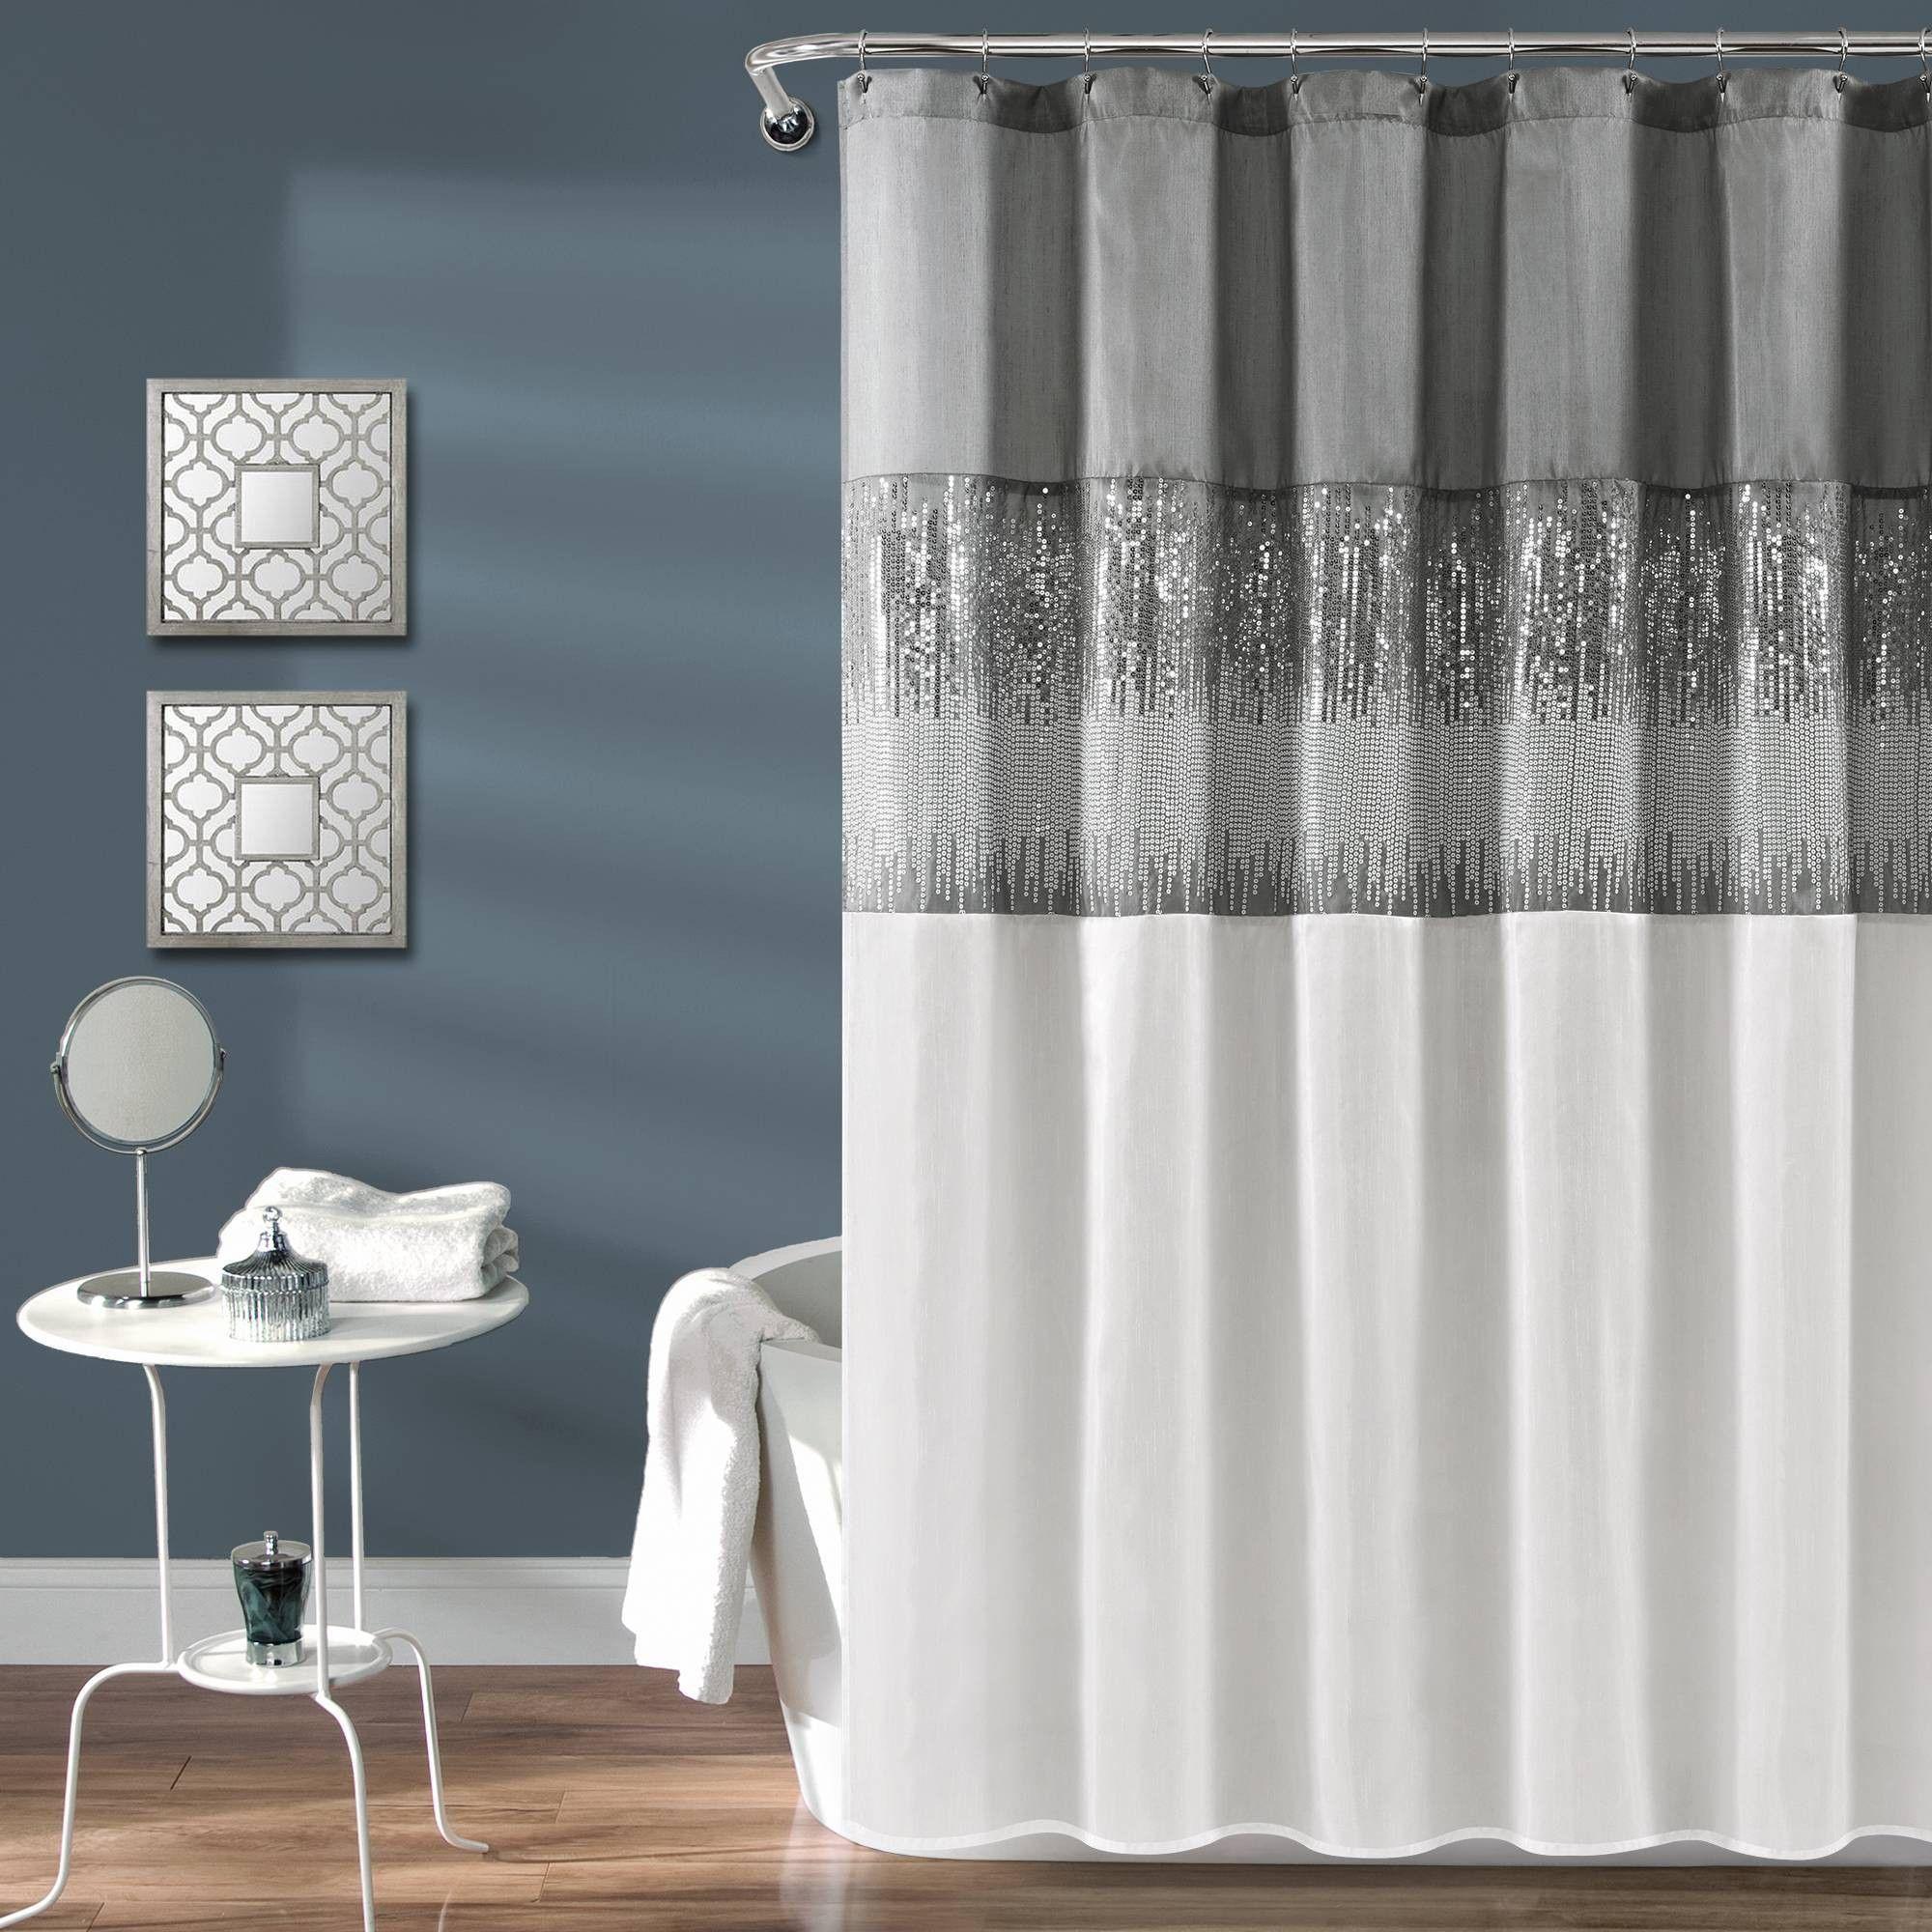 Night Sky Shower Curtain Gray White Lush Decor Adult Unisex In